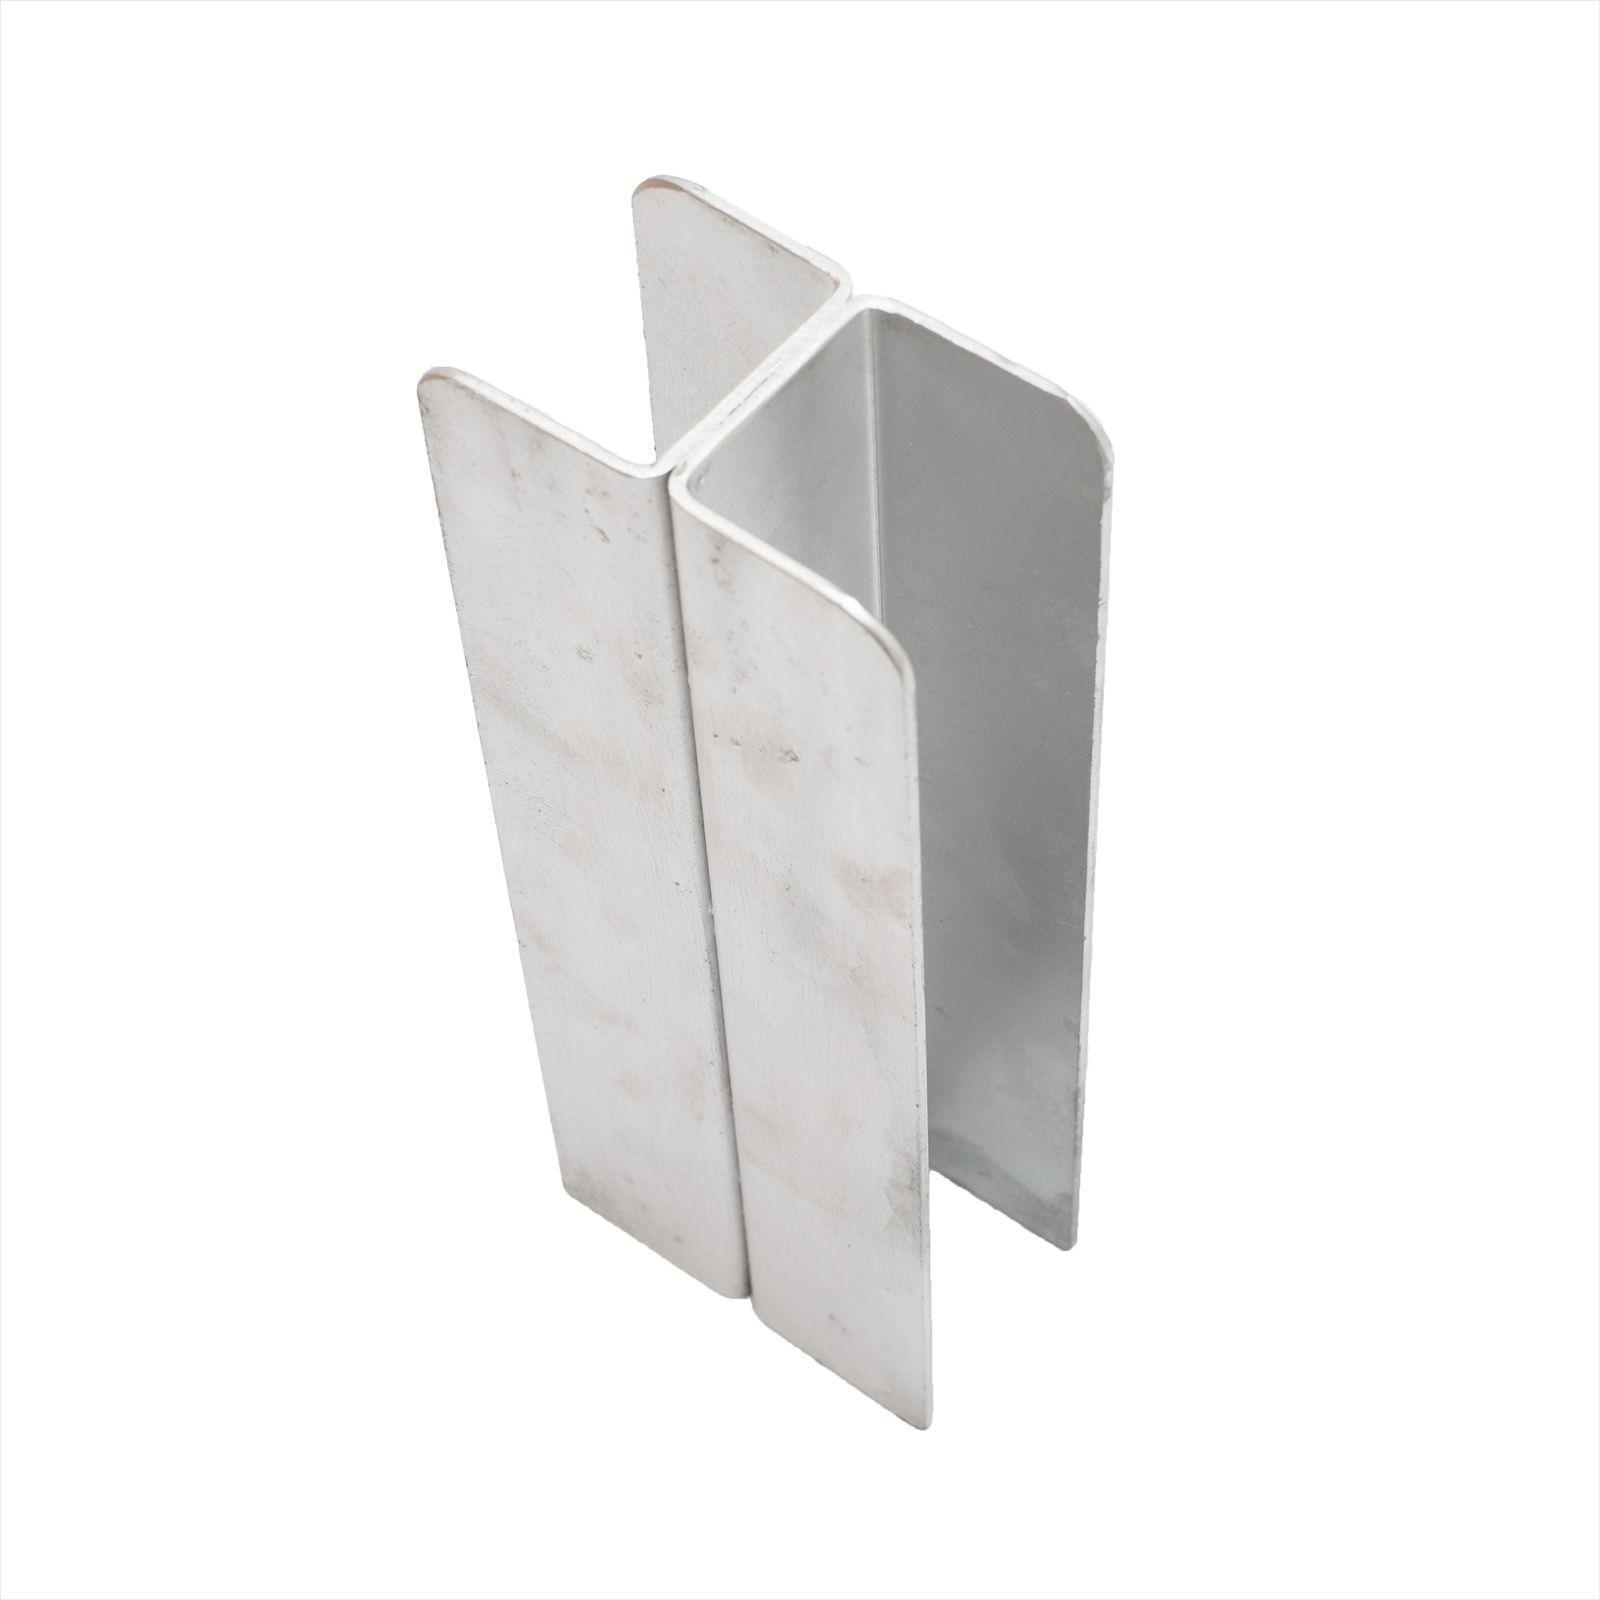 Ridgi 50mm x 50mm x 3mm x 1.5m Galvanised Steel Joiner Post